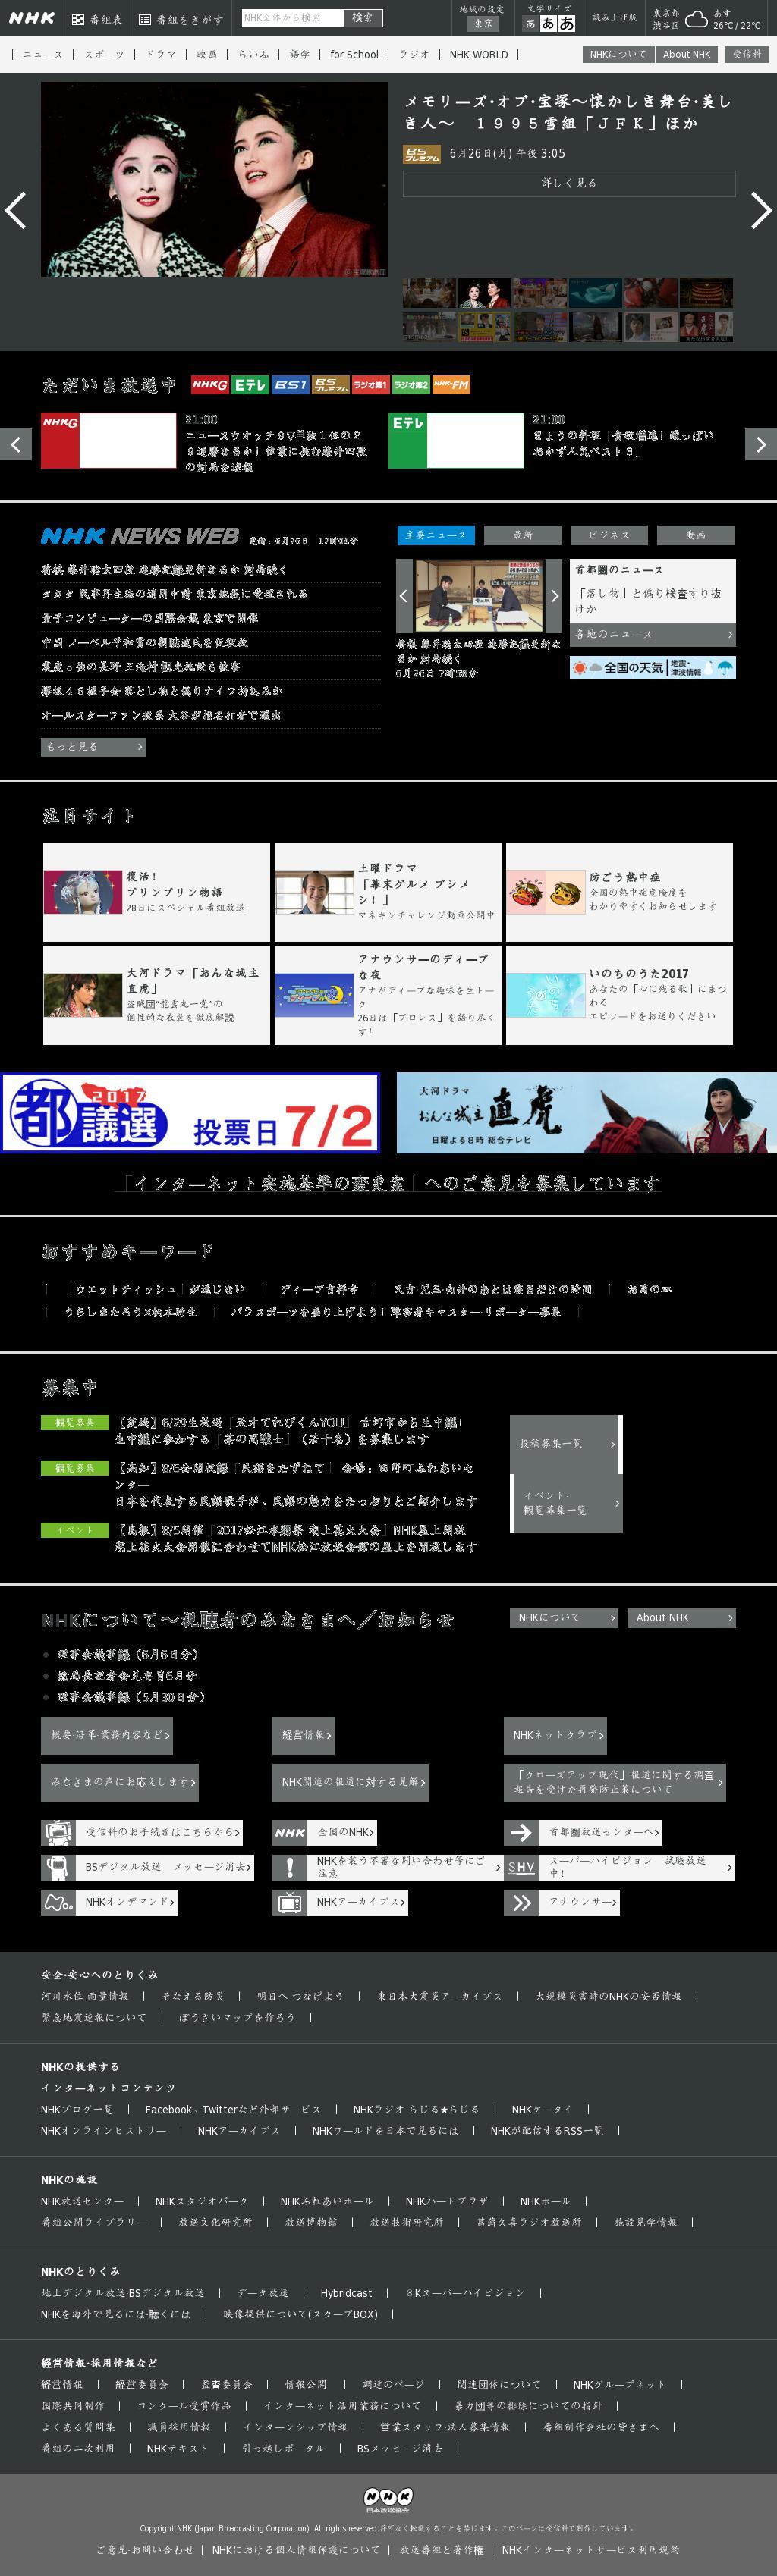 NHK Online at Monday June 26, 2017, 12:15 p.m. UTC